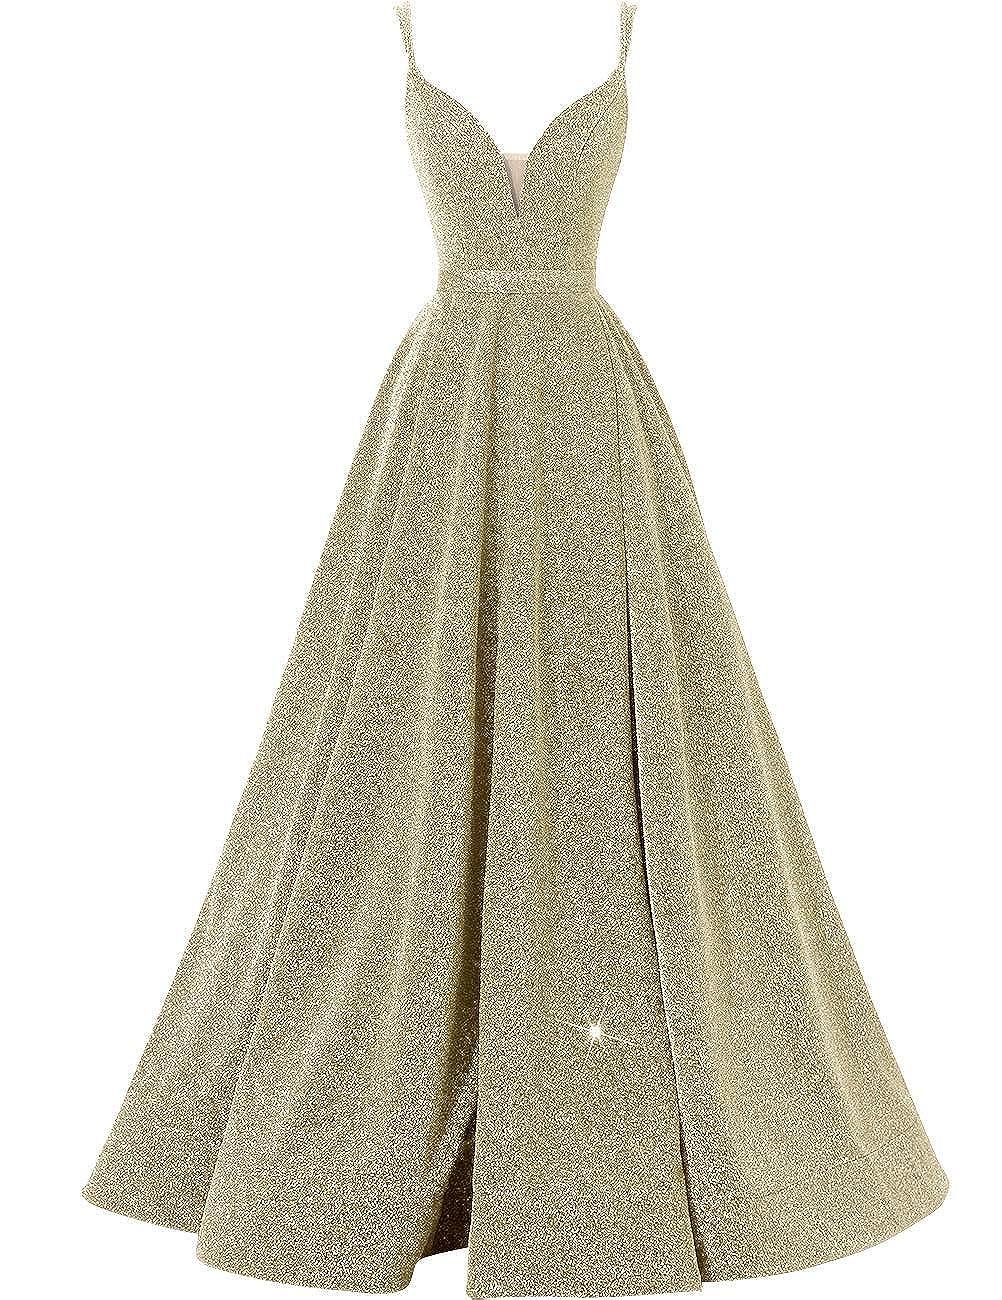 gold AnnaBride Women's Long Spaghetti Straps Prom Party Dresses Split V Neck Glitter Formal Ball Gowns 24PM